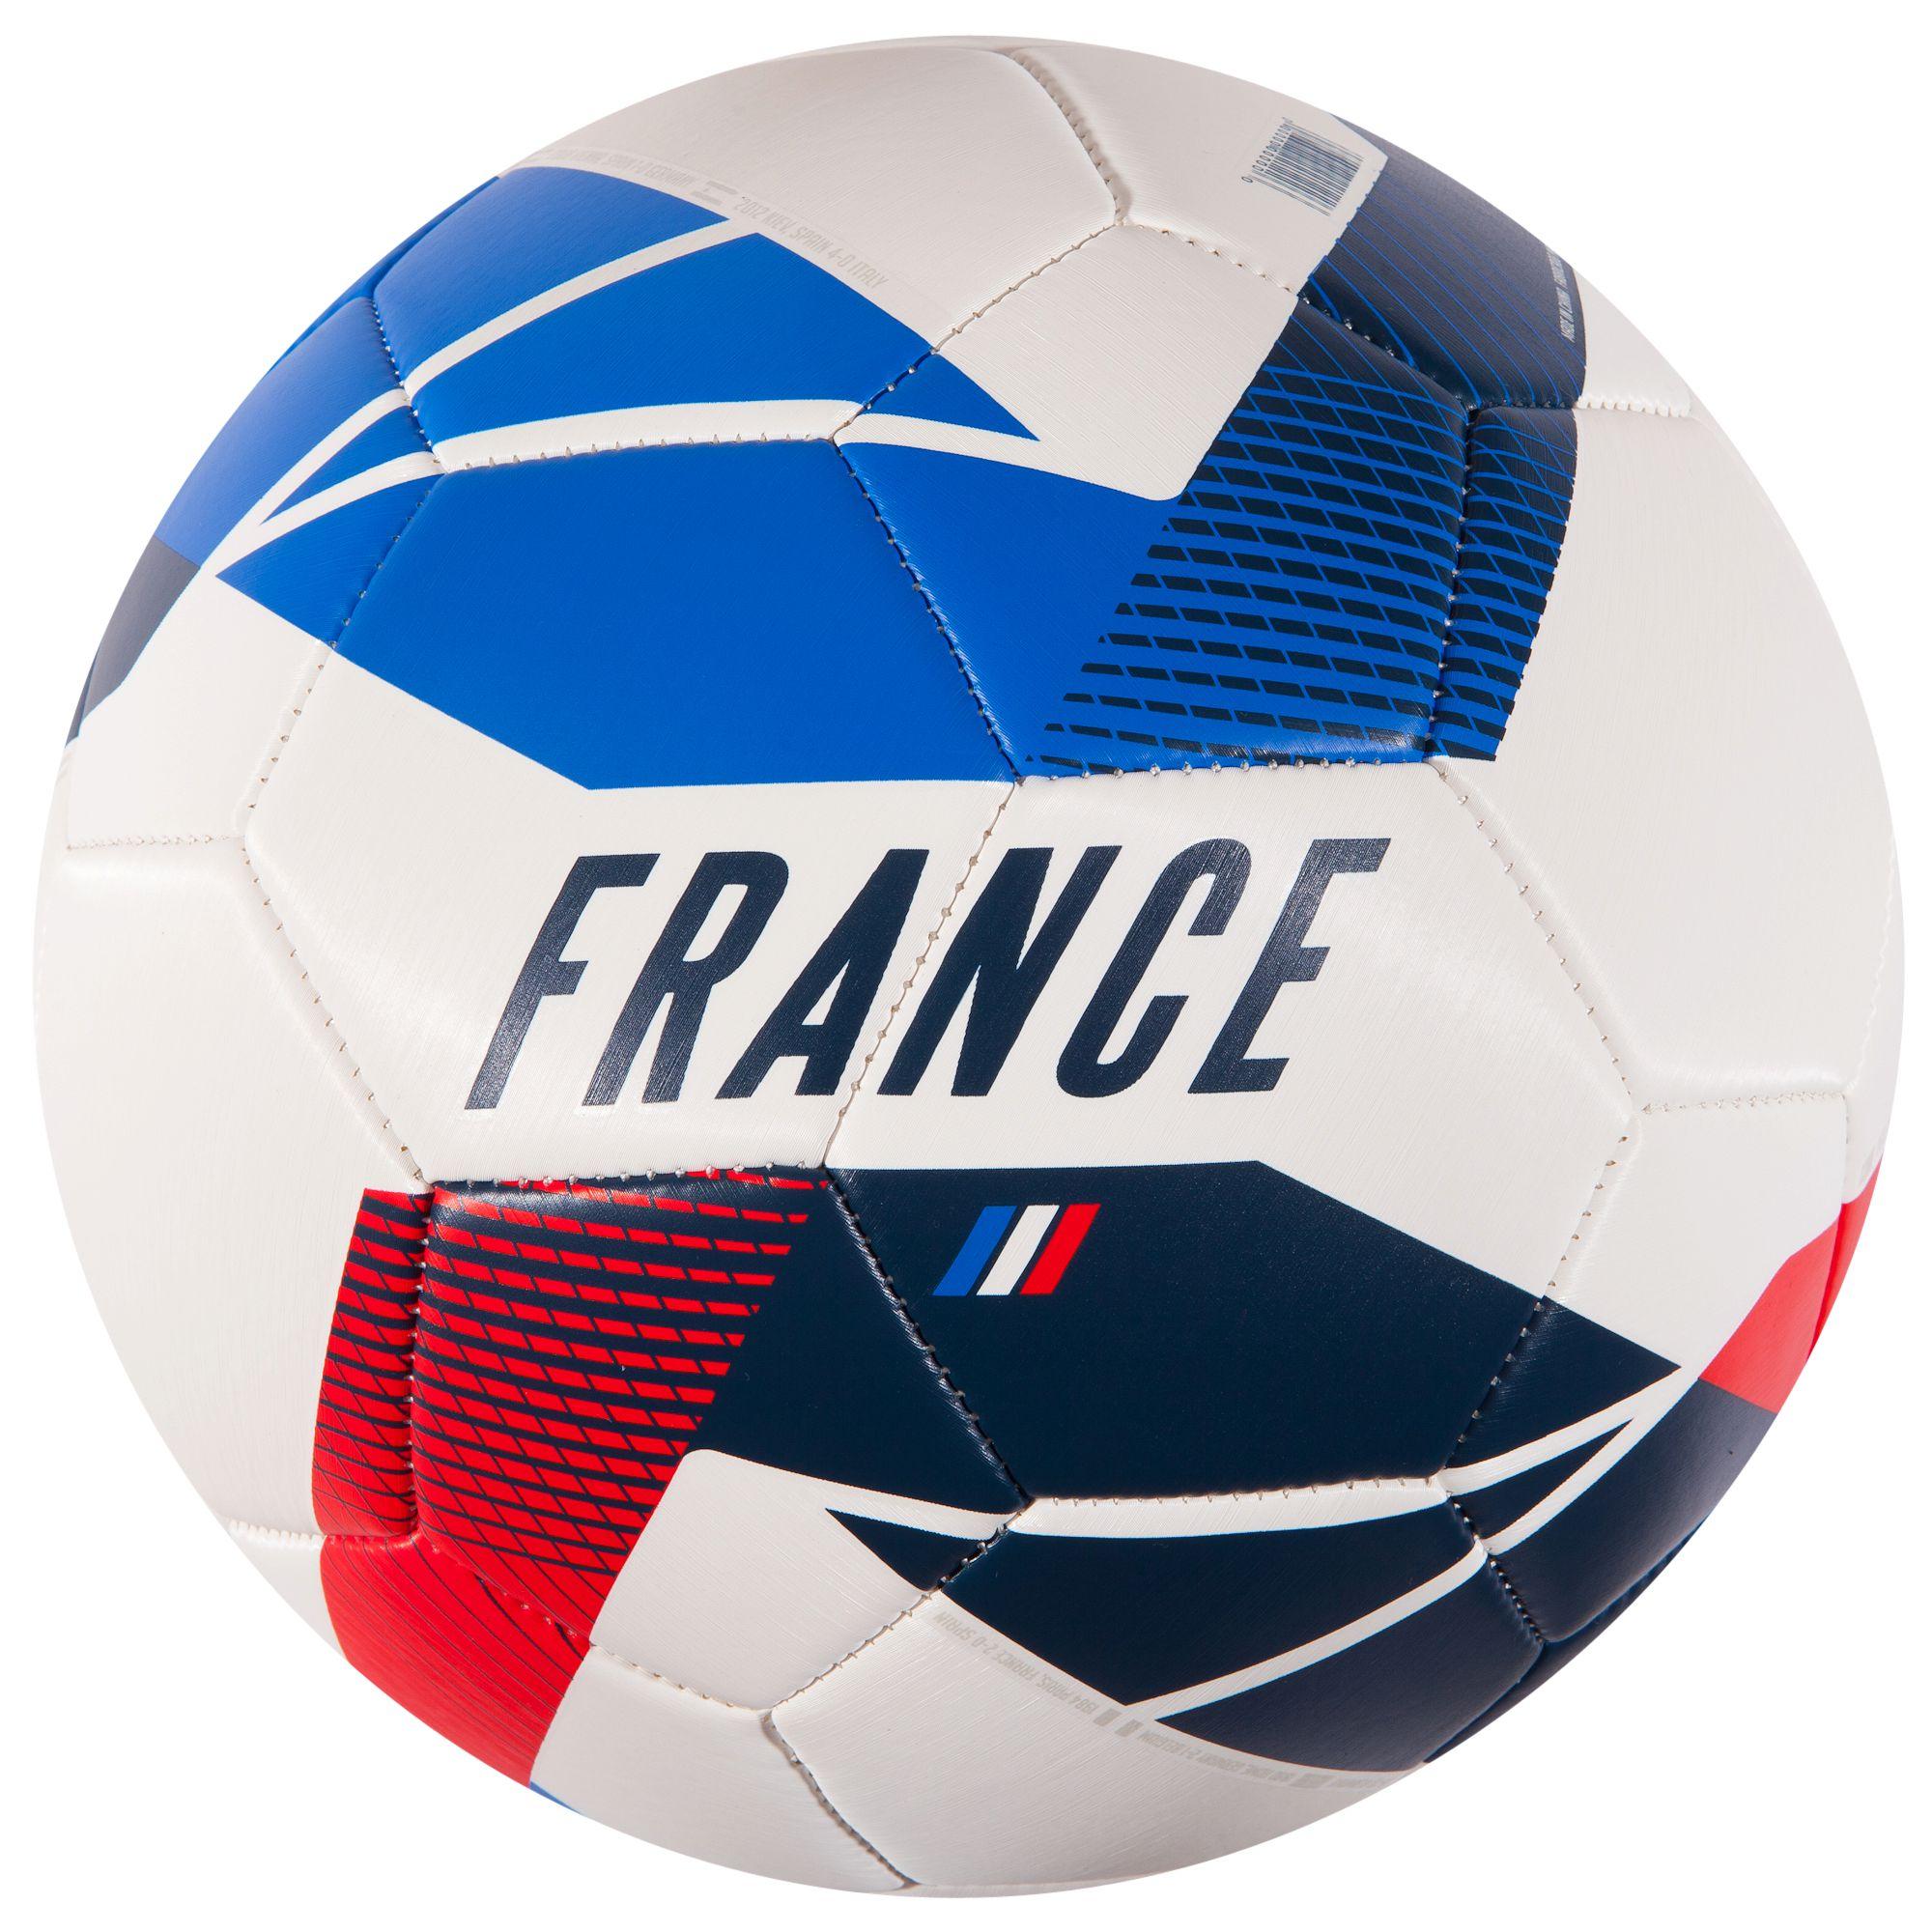 ballon football france taille 5 bleu blanc rouge clubs collectivit s decathlon pro. Black Bedroom Furniture Sets. Home Design Ideas